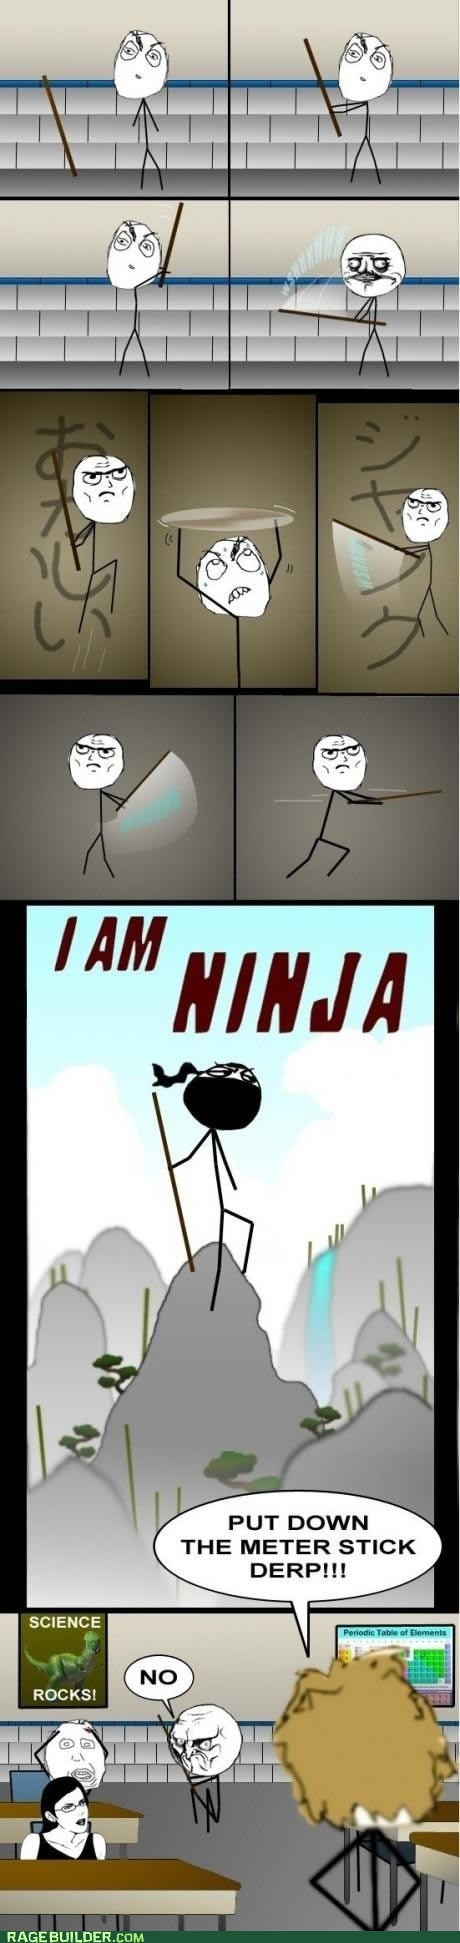 samurai school me gusta ninjas nunchuks funny truancy story yardsticks - 7435954688